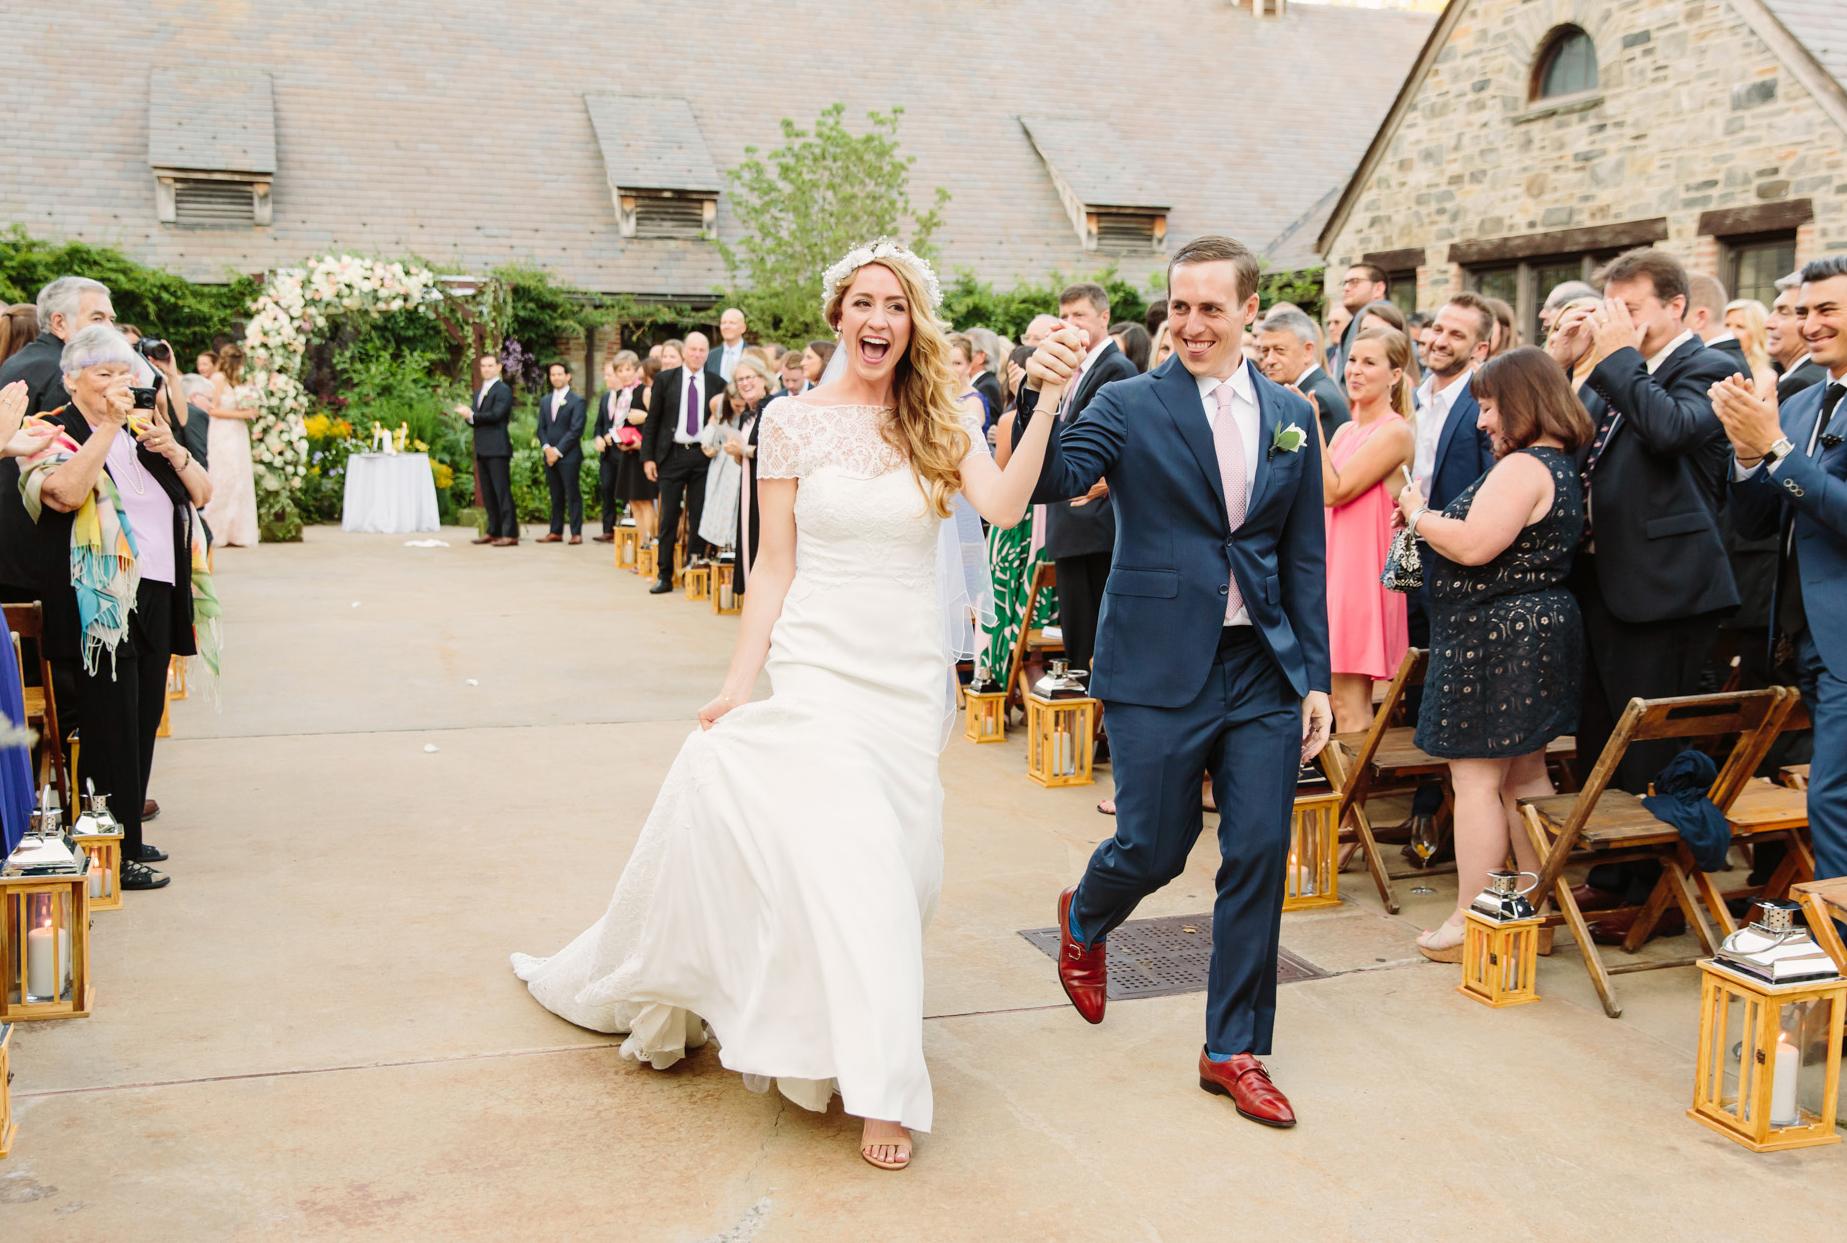 50_Jessica_Ted_Blue_Hill_Stone_Barns_Wedding_Pocantico_NY_Tanya_Salazar_Photography_138.jpg